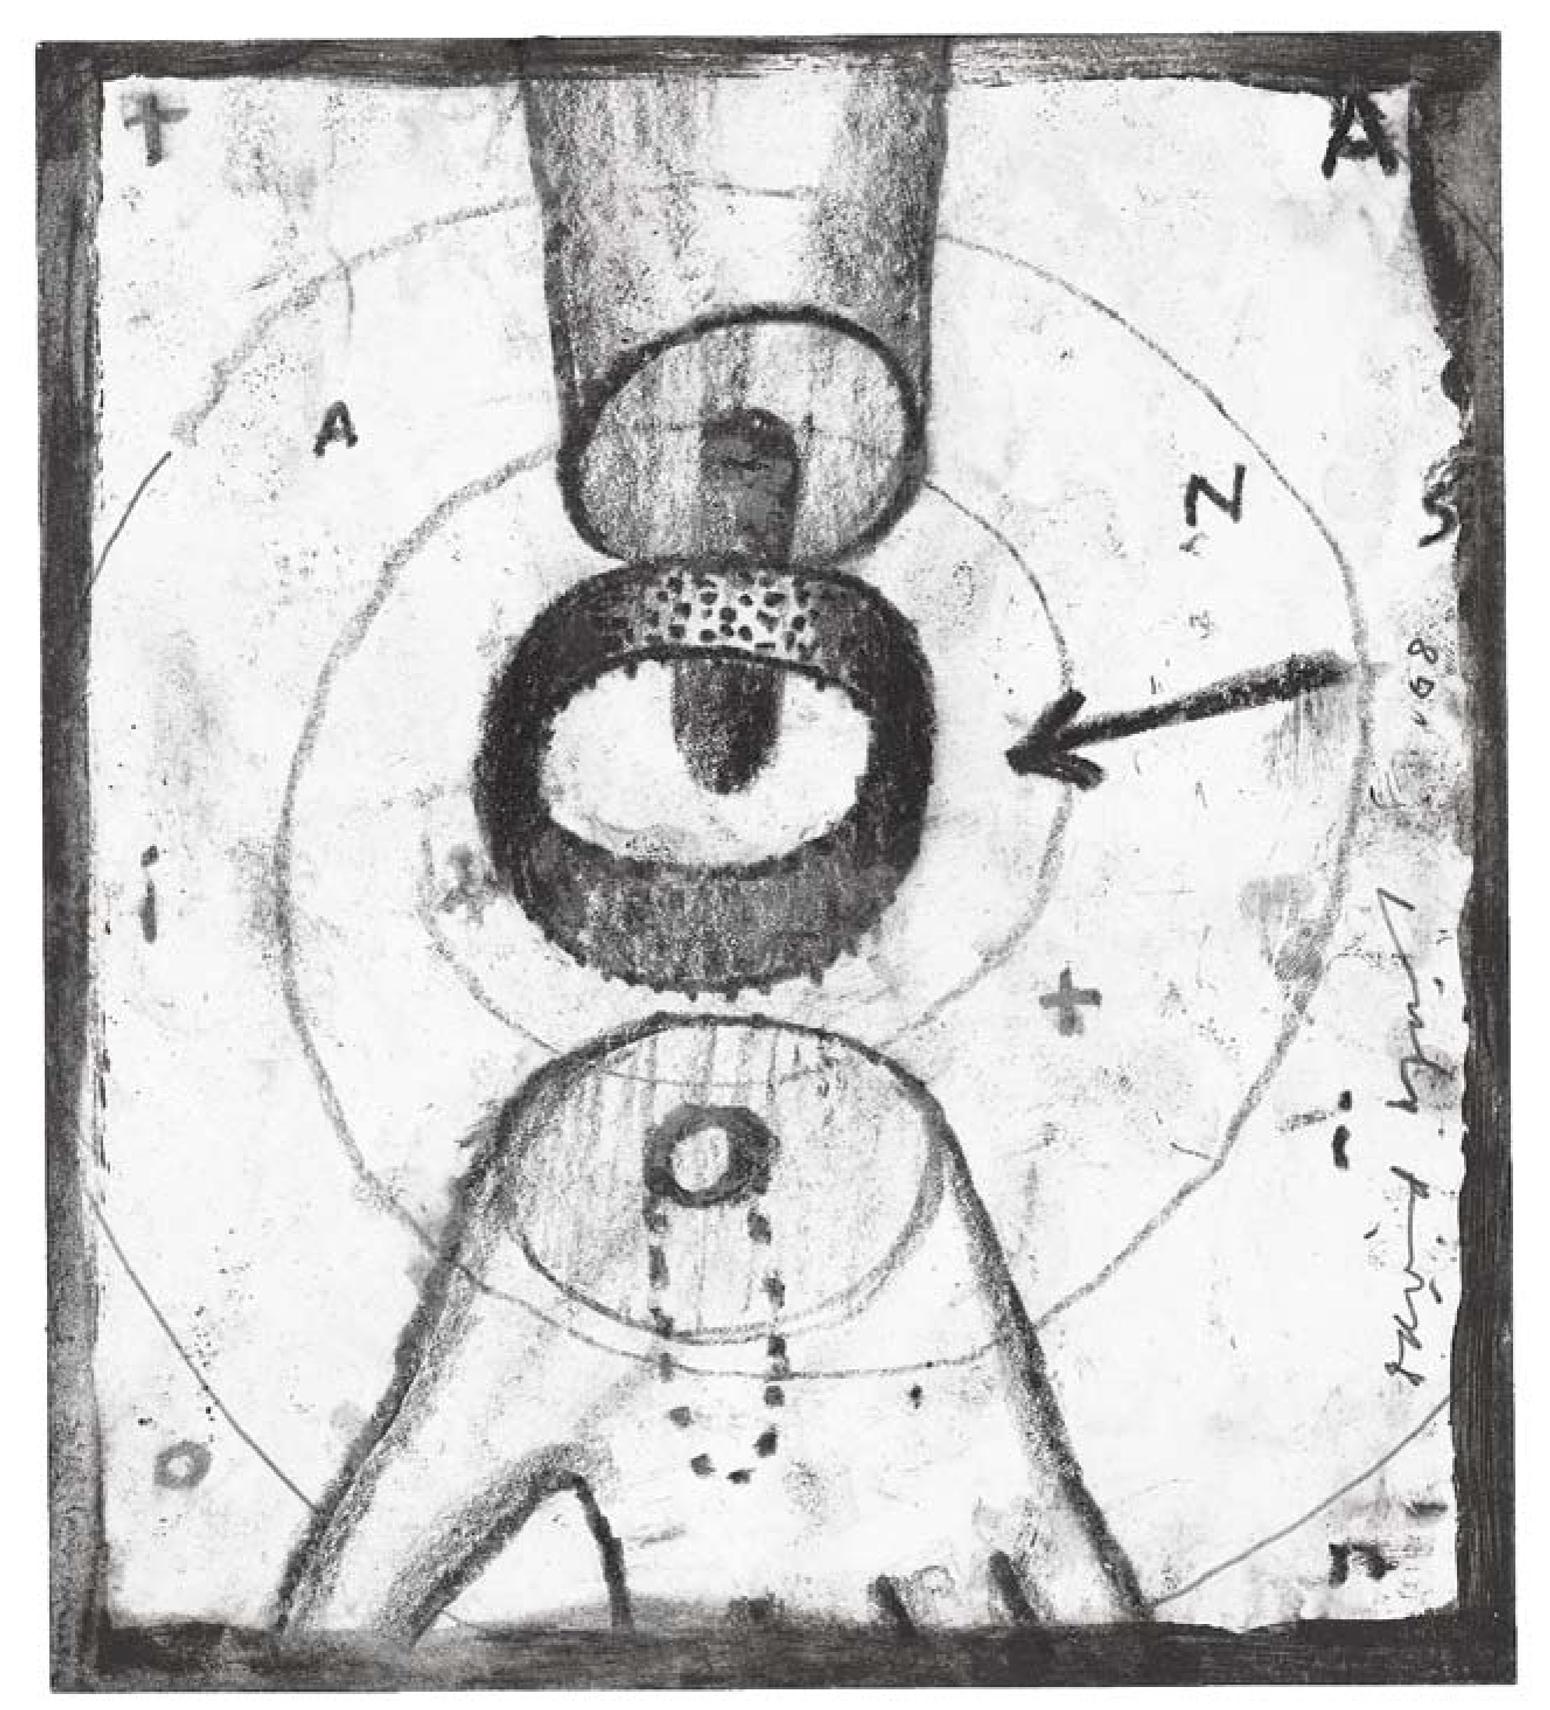 T.R.A.N.S.I.T.I.O.N. Charcoal and pen on paper, 18 x 16 cm, 2008